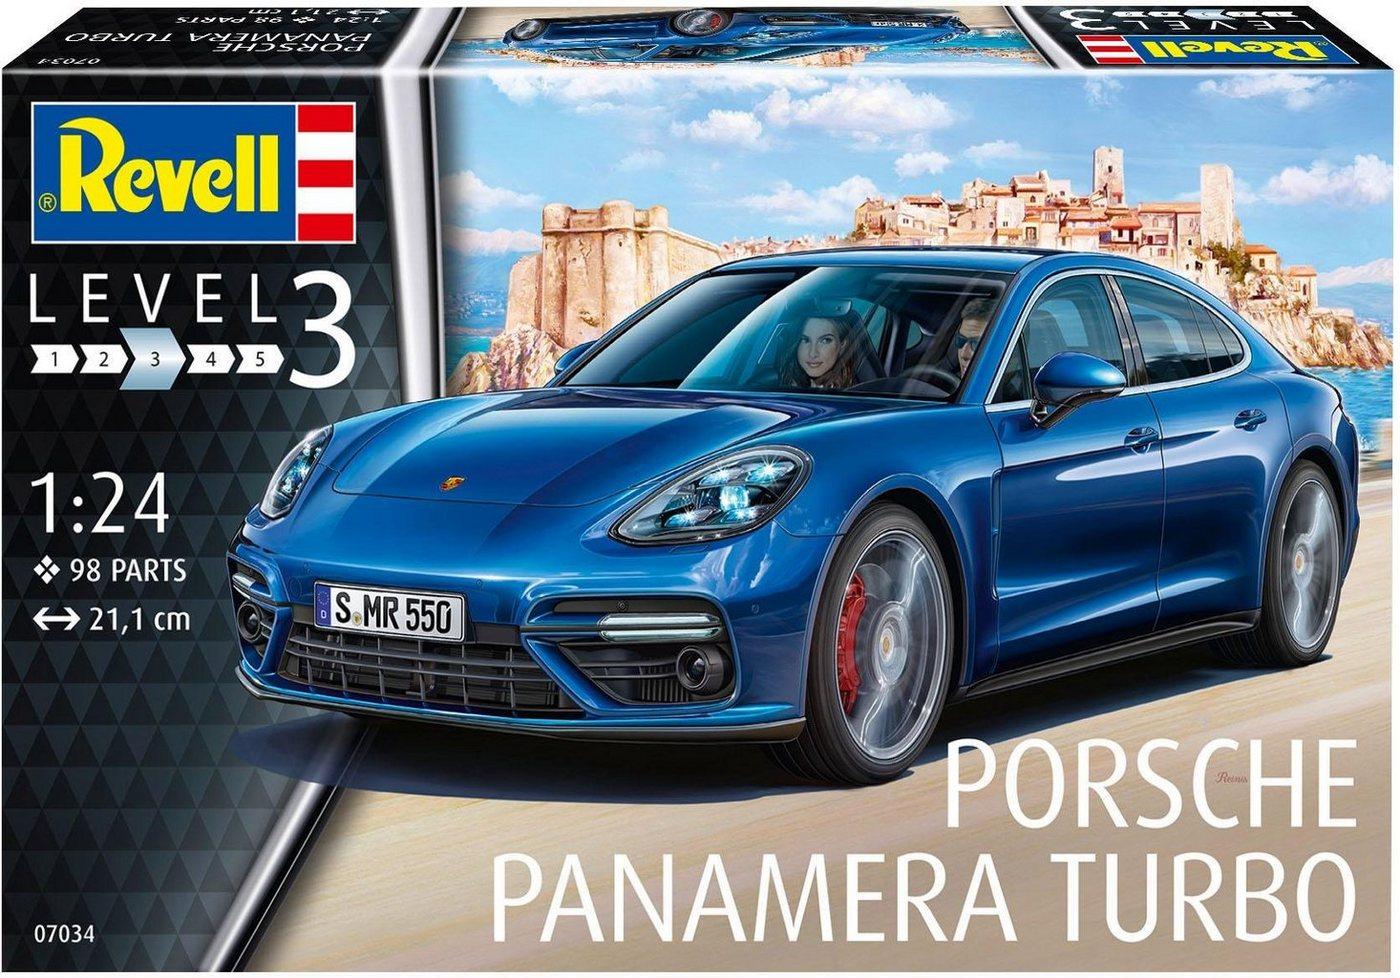 Revell Modellbausatz Auto mit Zubehör Maßstab 1:24, »Model Set Porsche Panamera Turbo«